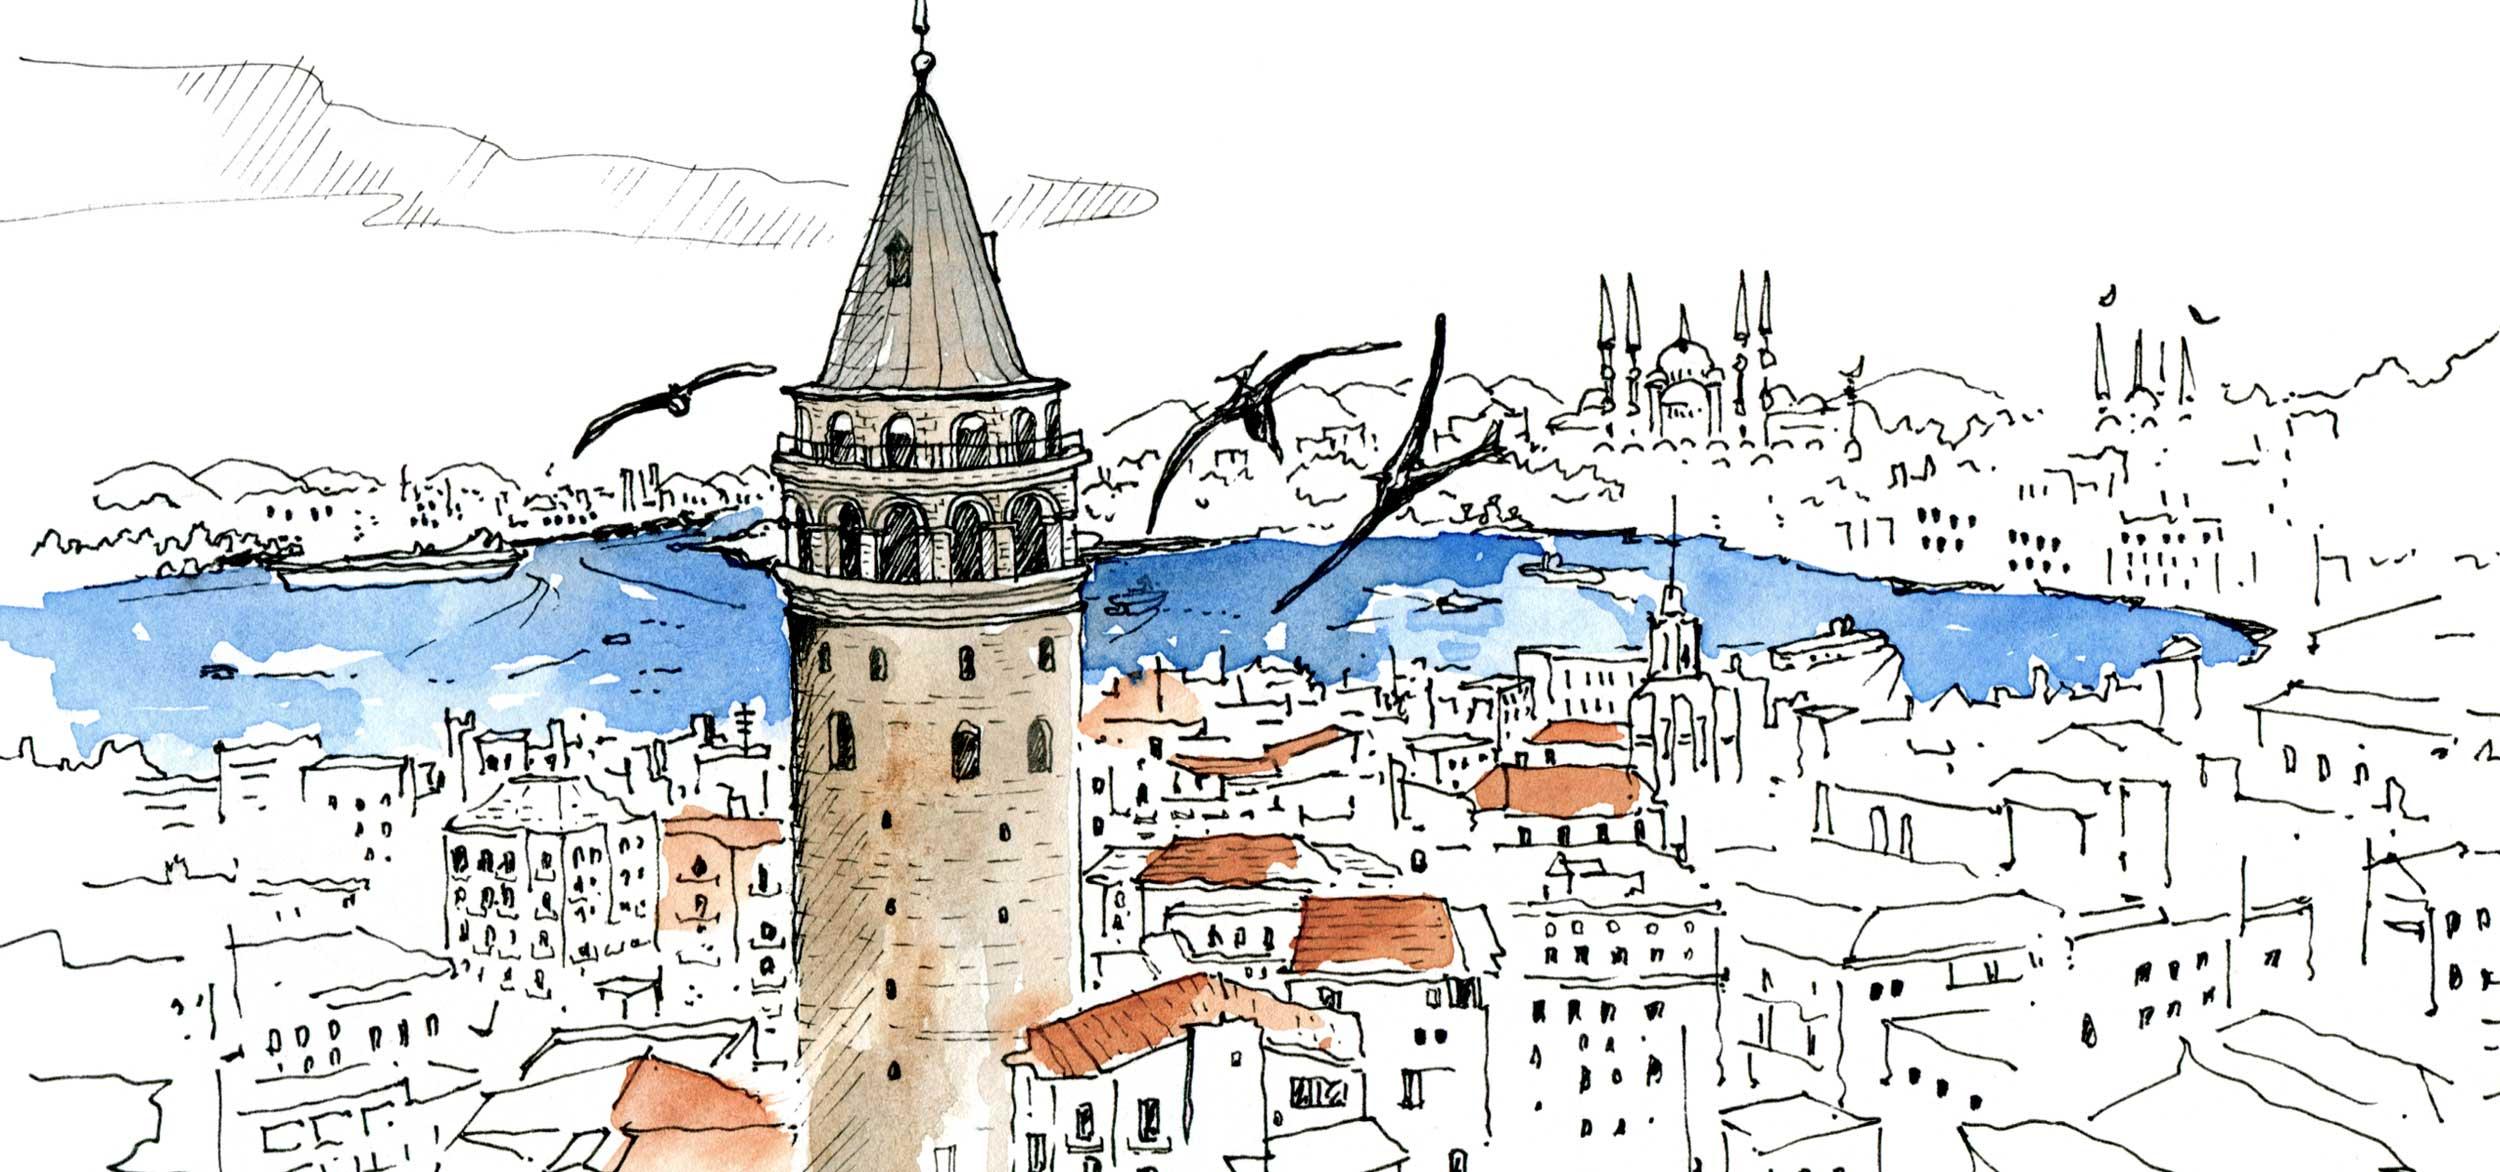 Istanbul by bike